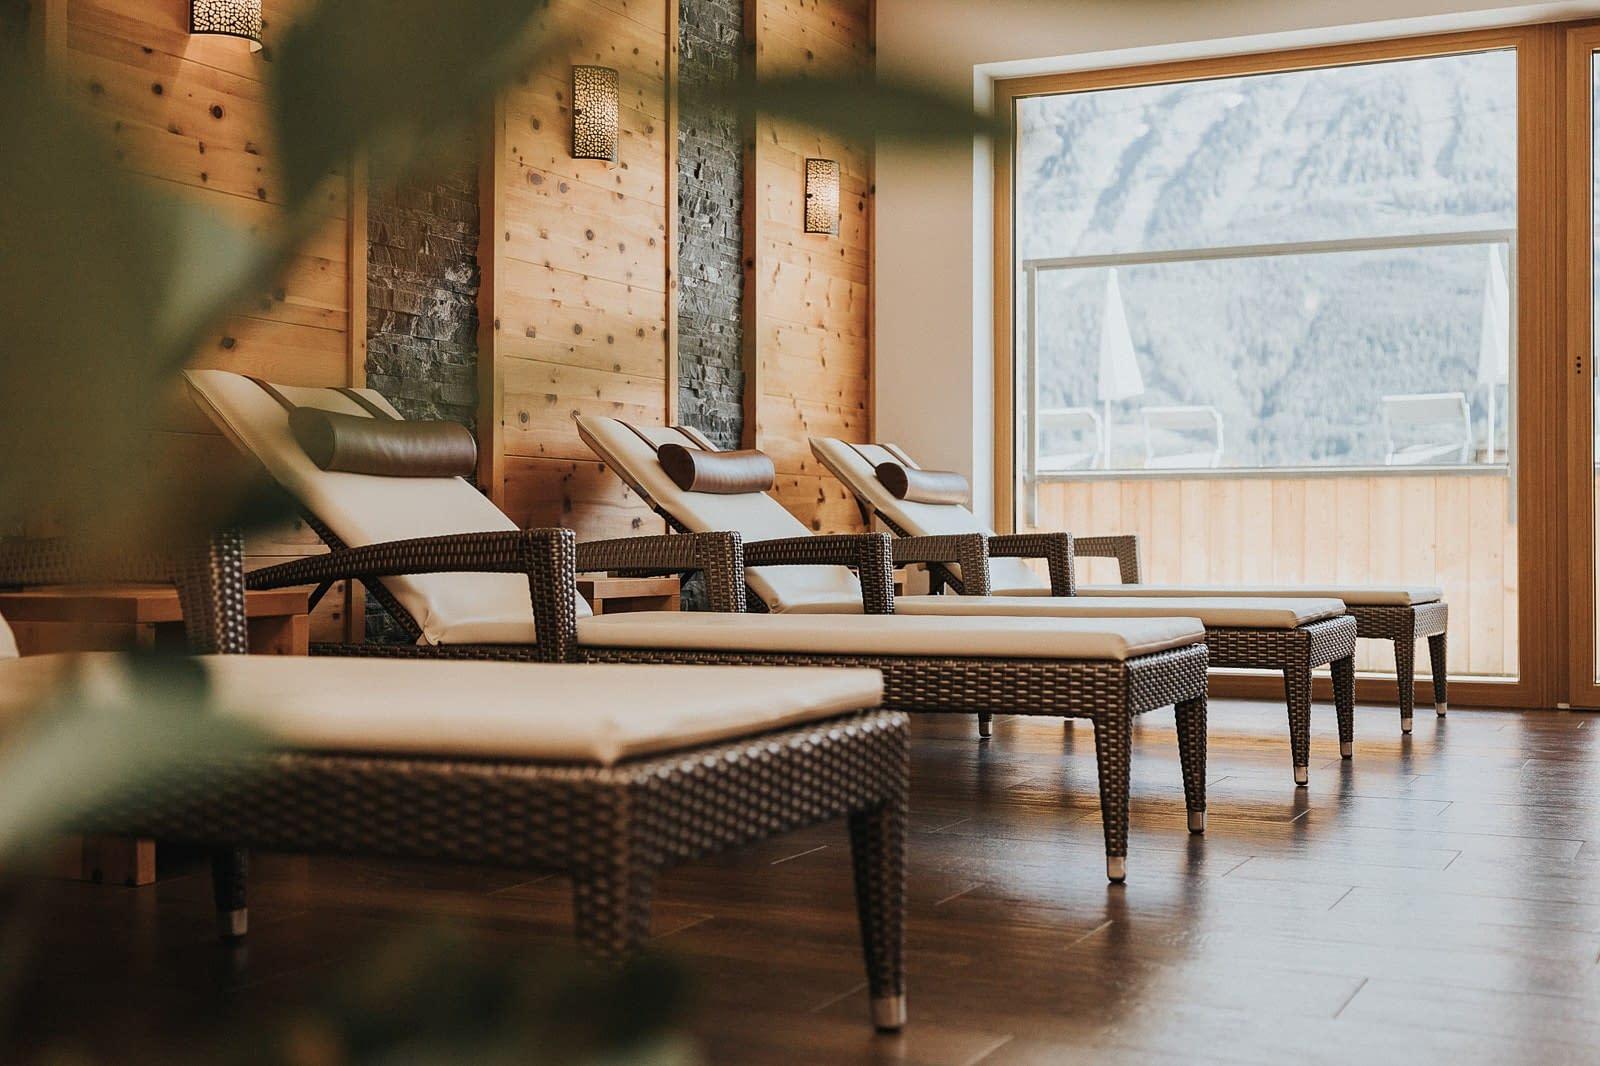 Spa - Hotel Fotografie - Silberfux